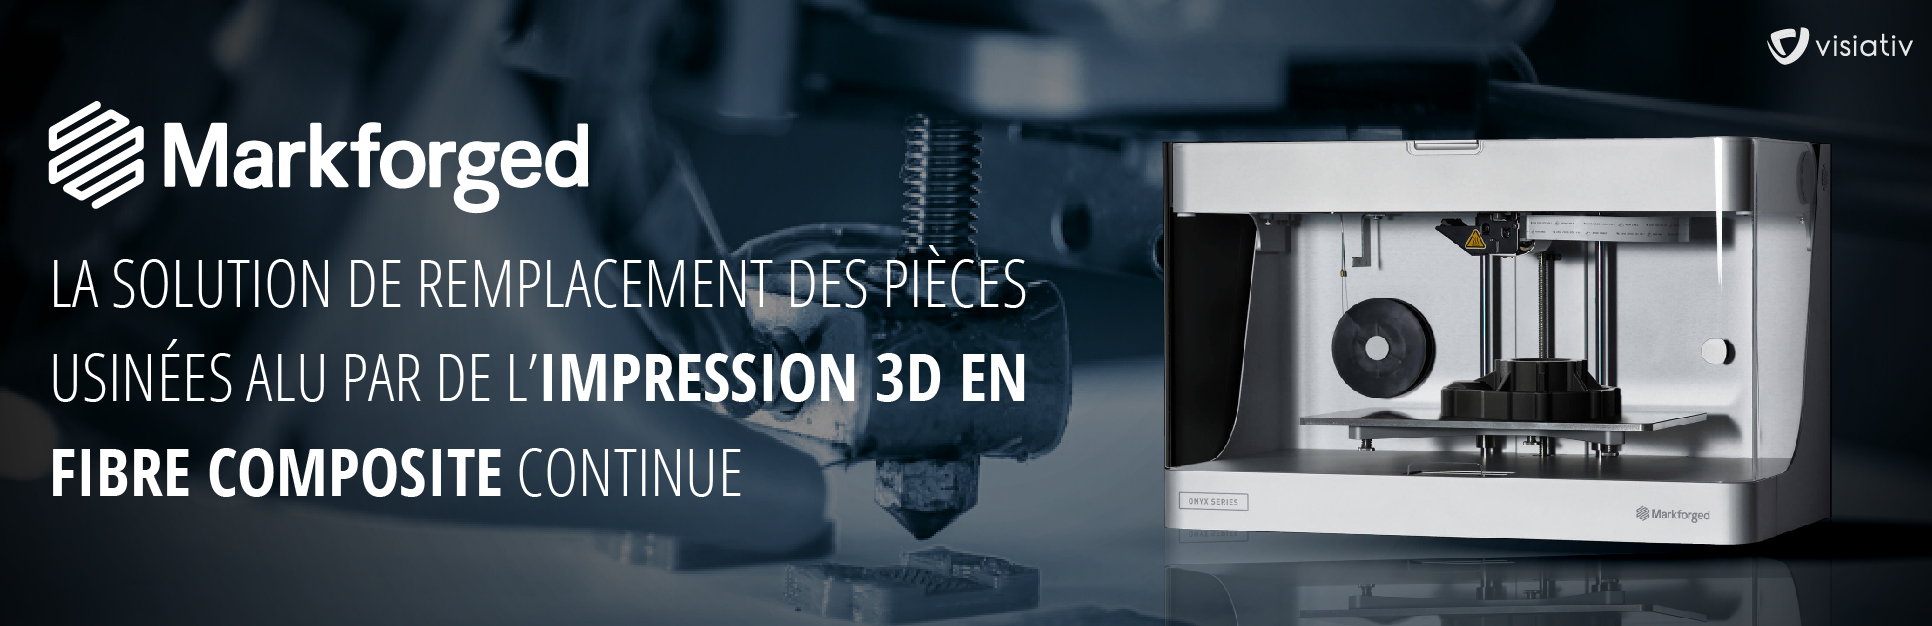 MARKFORGED, LA SOLUTION D'IMPRESSION 3D INDUSTRIELLE INNOVANTE